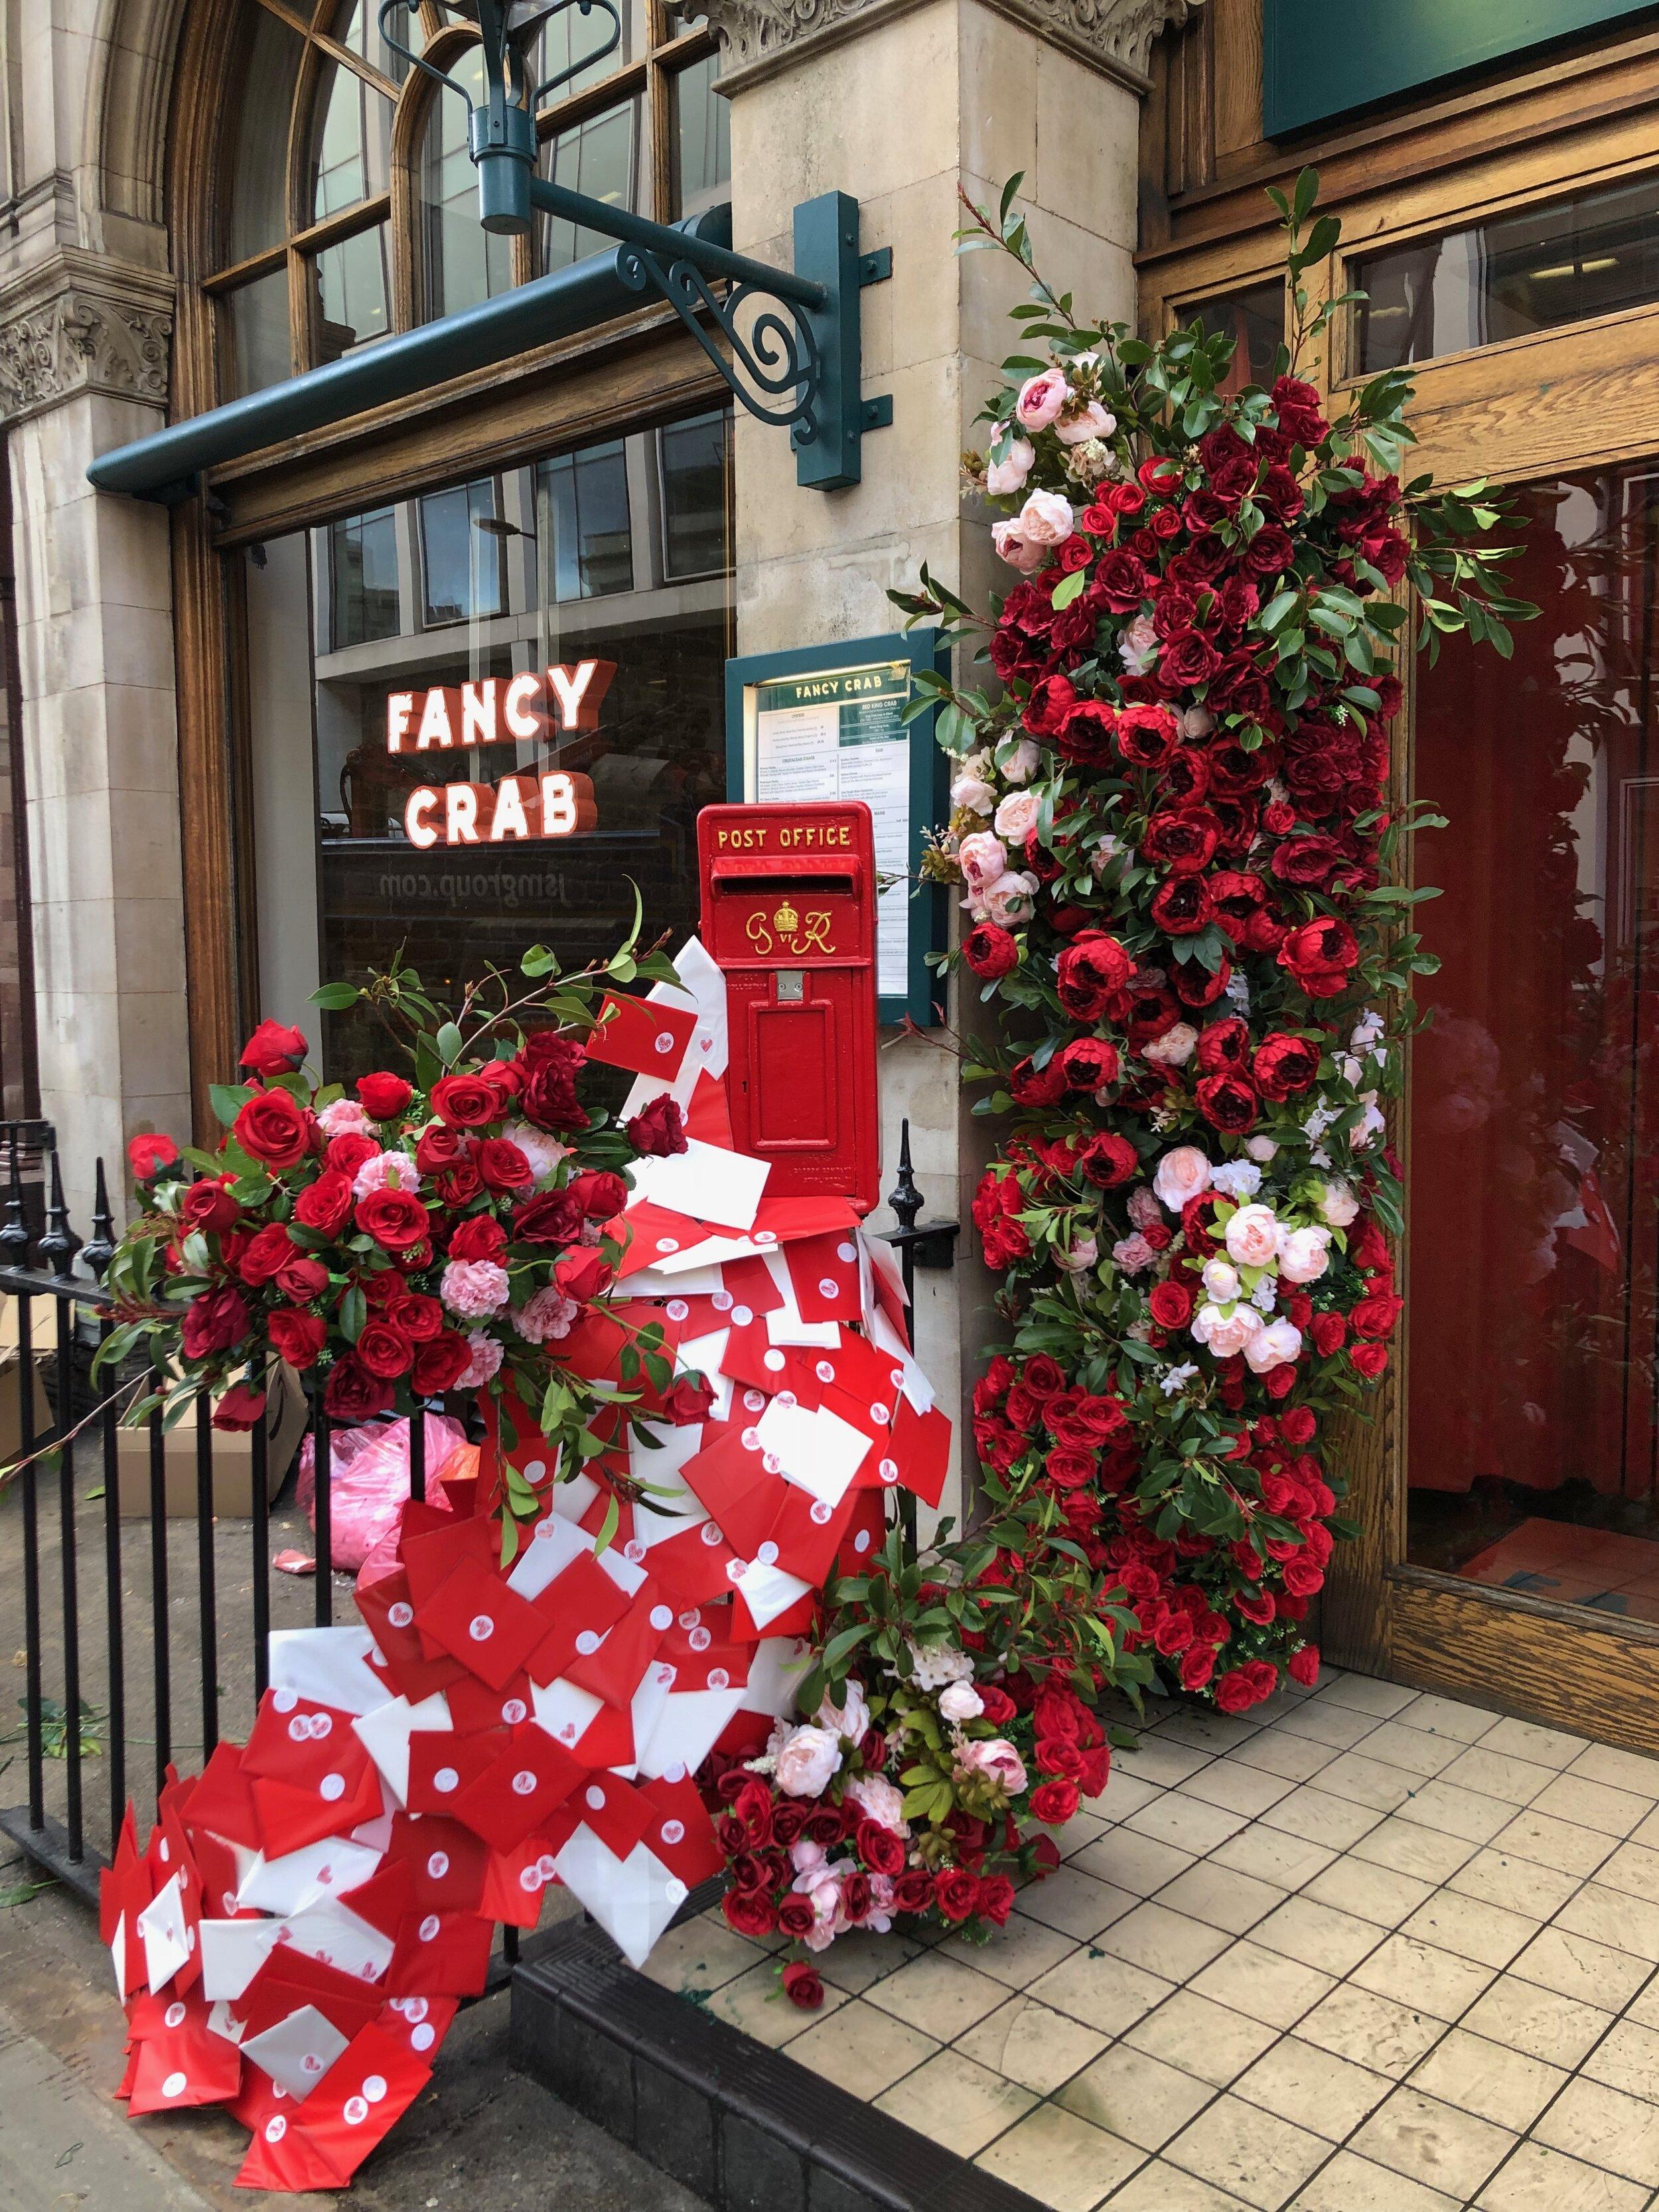 Be My Valentine - FANCY CRAB | LONDON